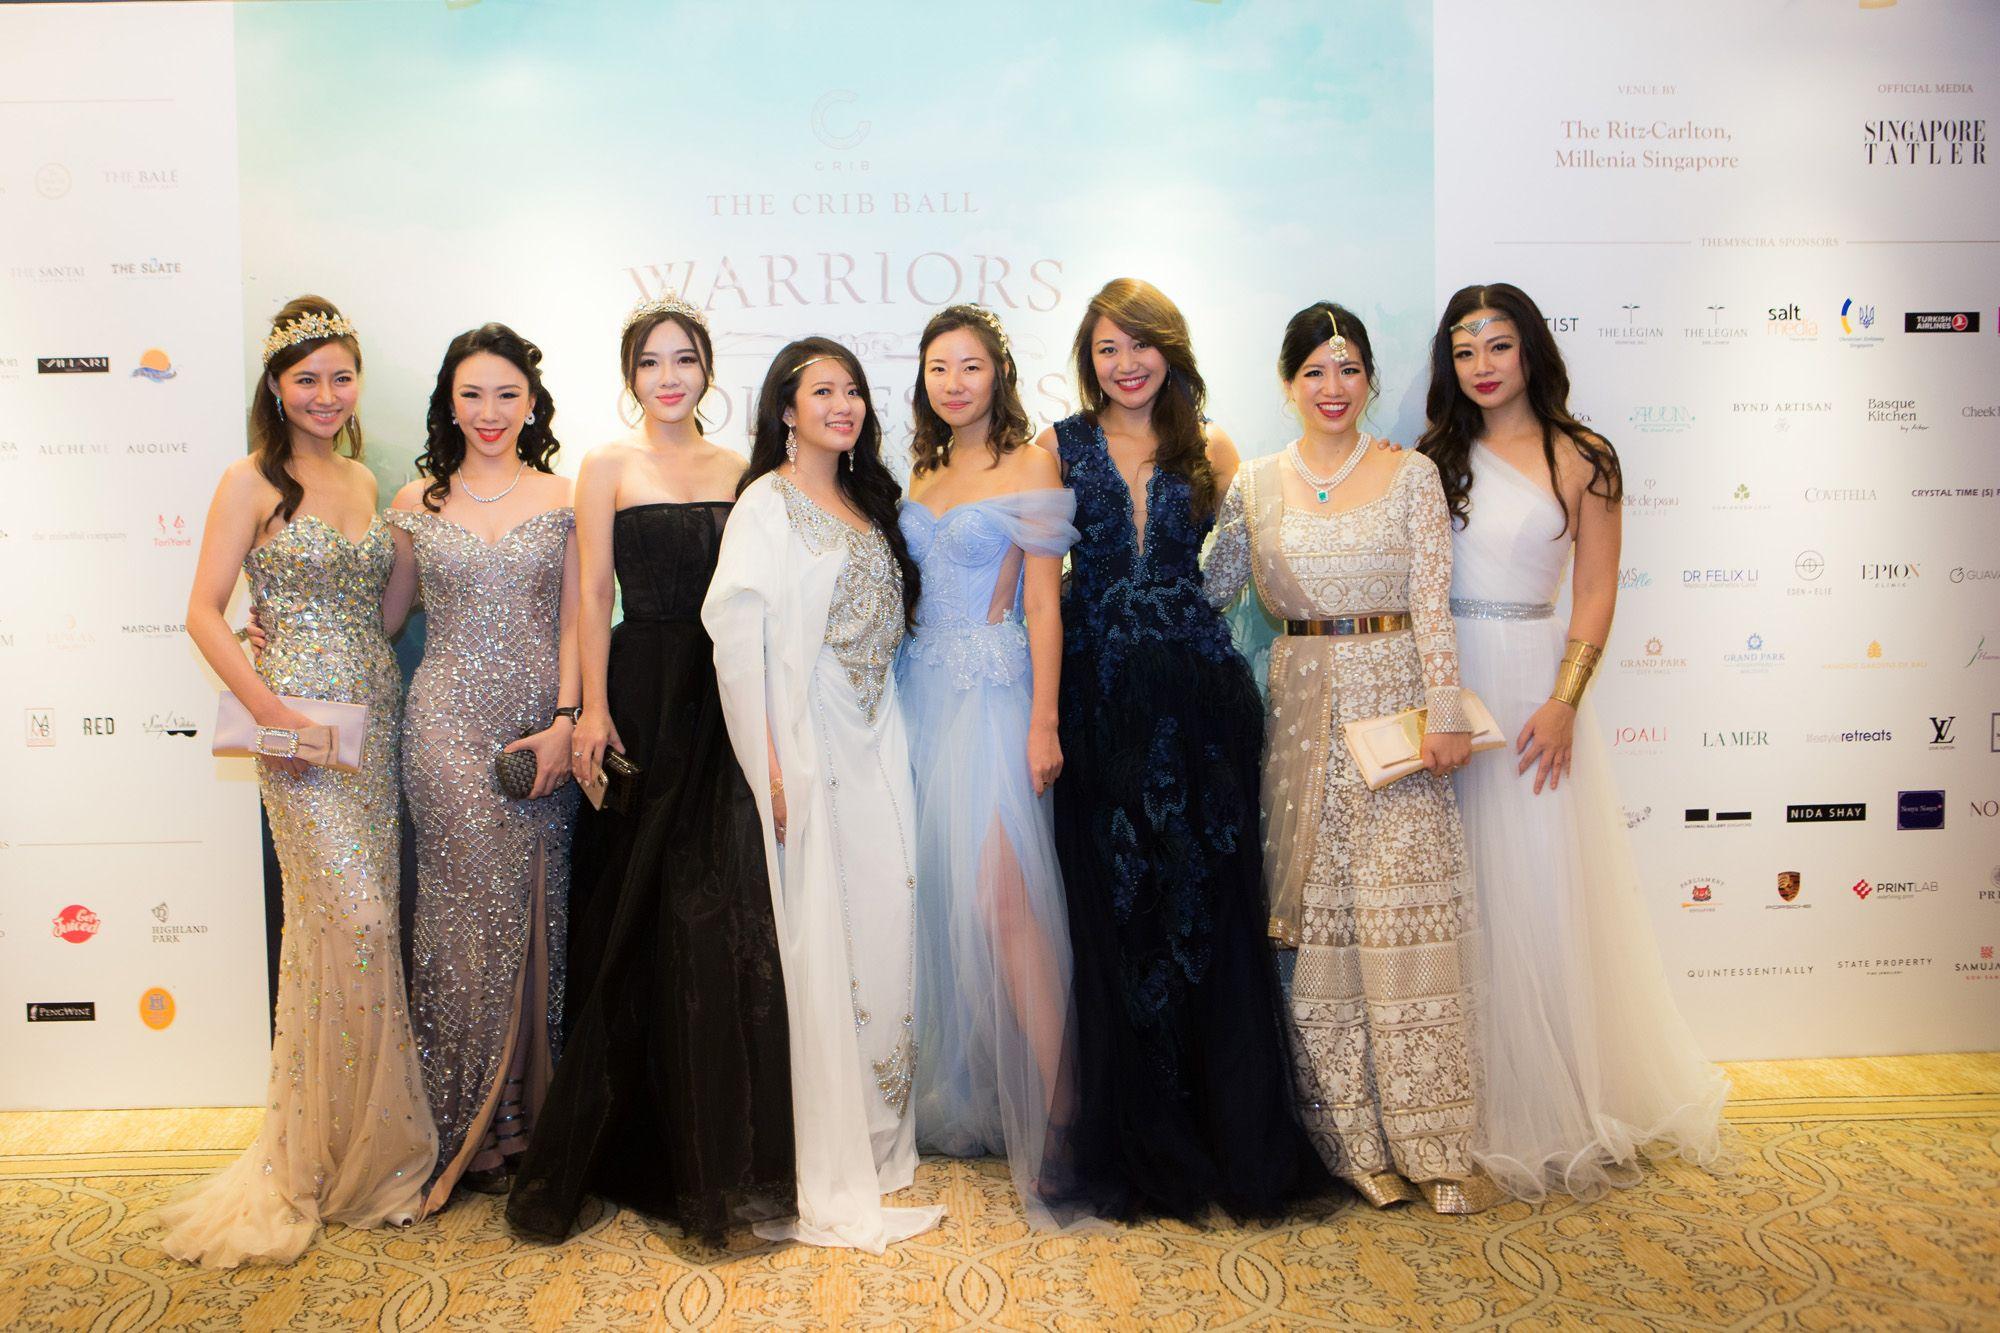 Cheryl Wee, Loh May-Han, Ang Jin Yuan, Elaine Kim, Melissa Lim, Anna Vanessa Haotanto, Leanne Robers, Tjin Lee